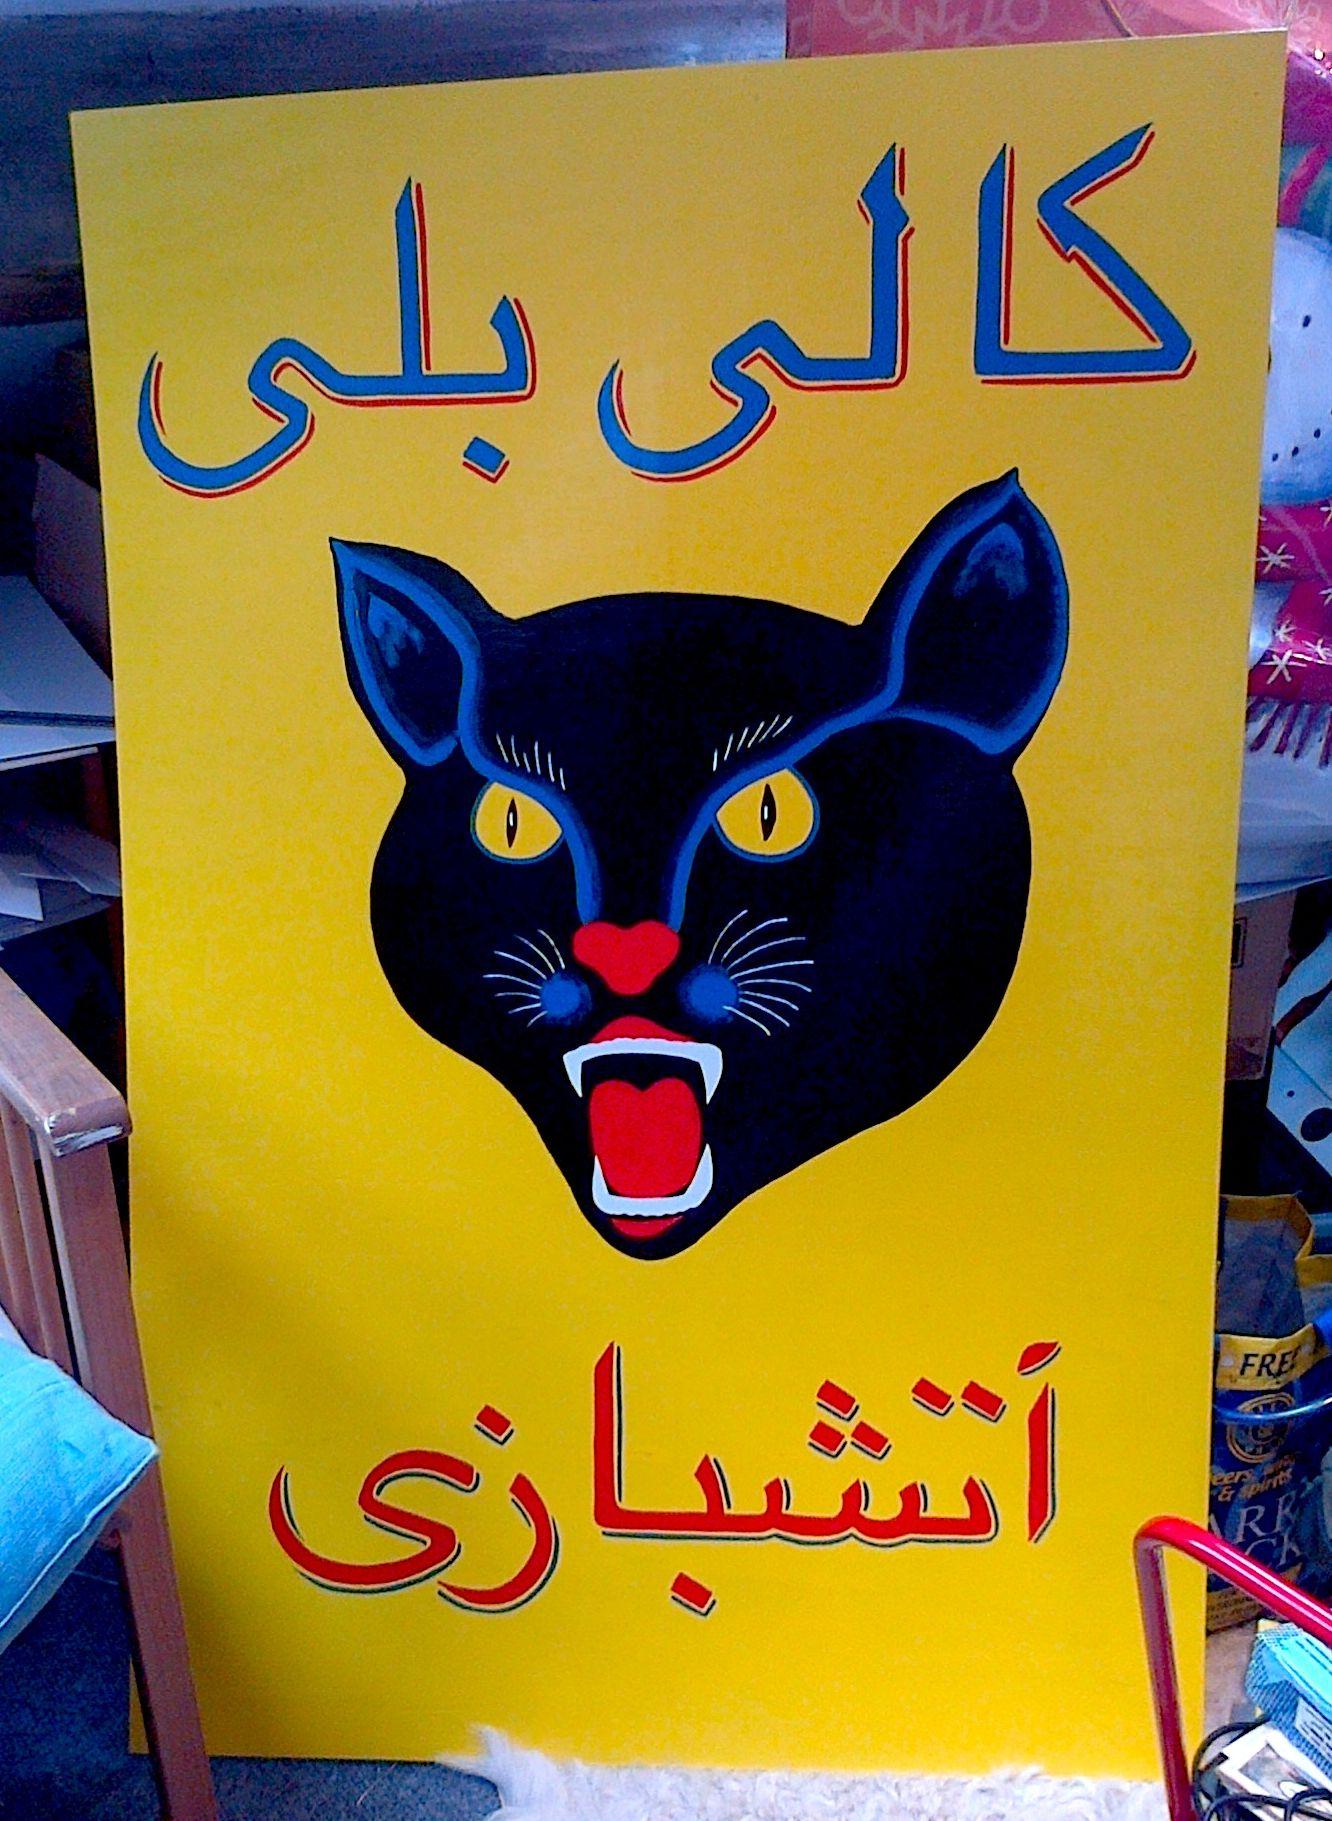 'Black Cat Fireworks' in Urdu Black cat fireworks, Black